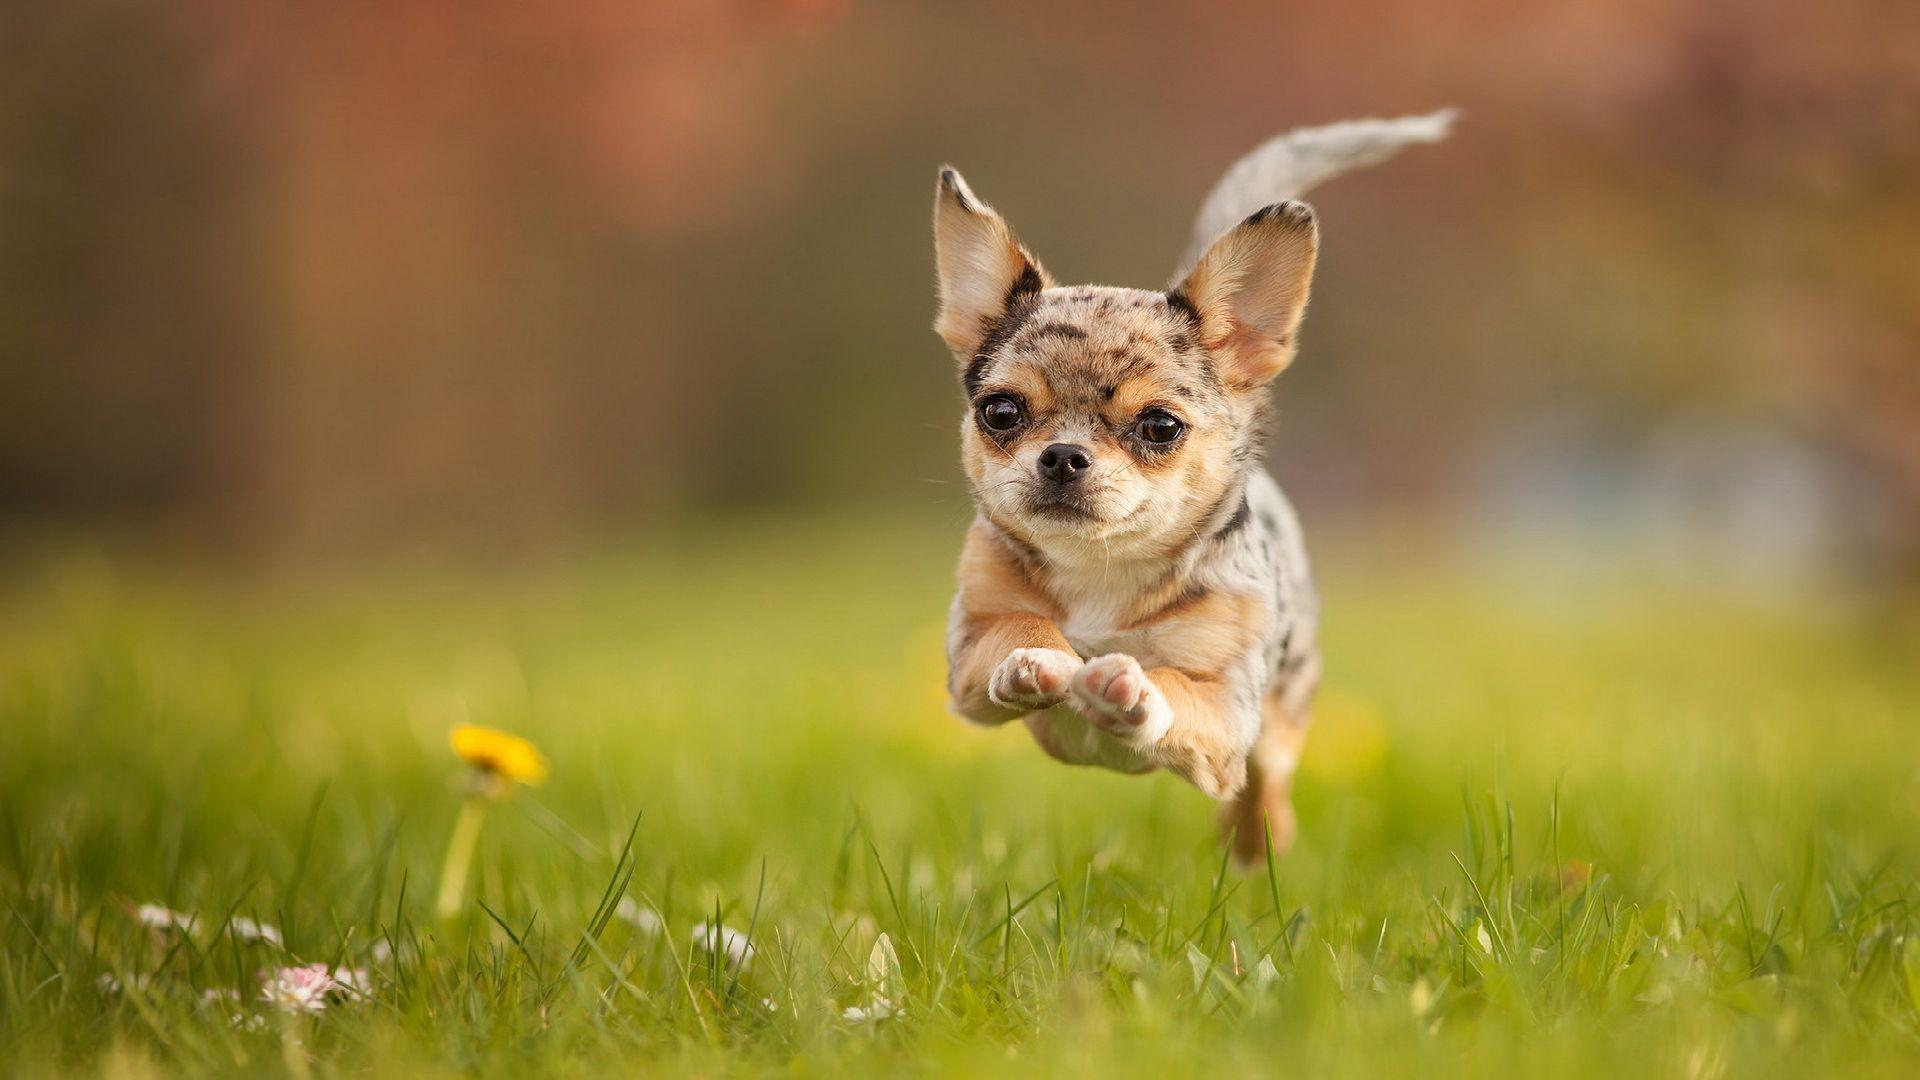 Wallpaper Chihuahua